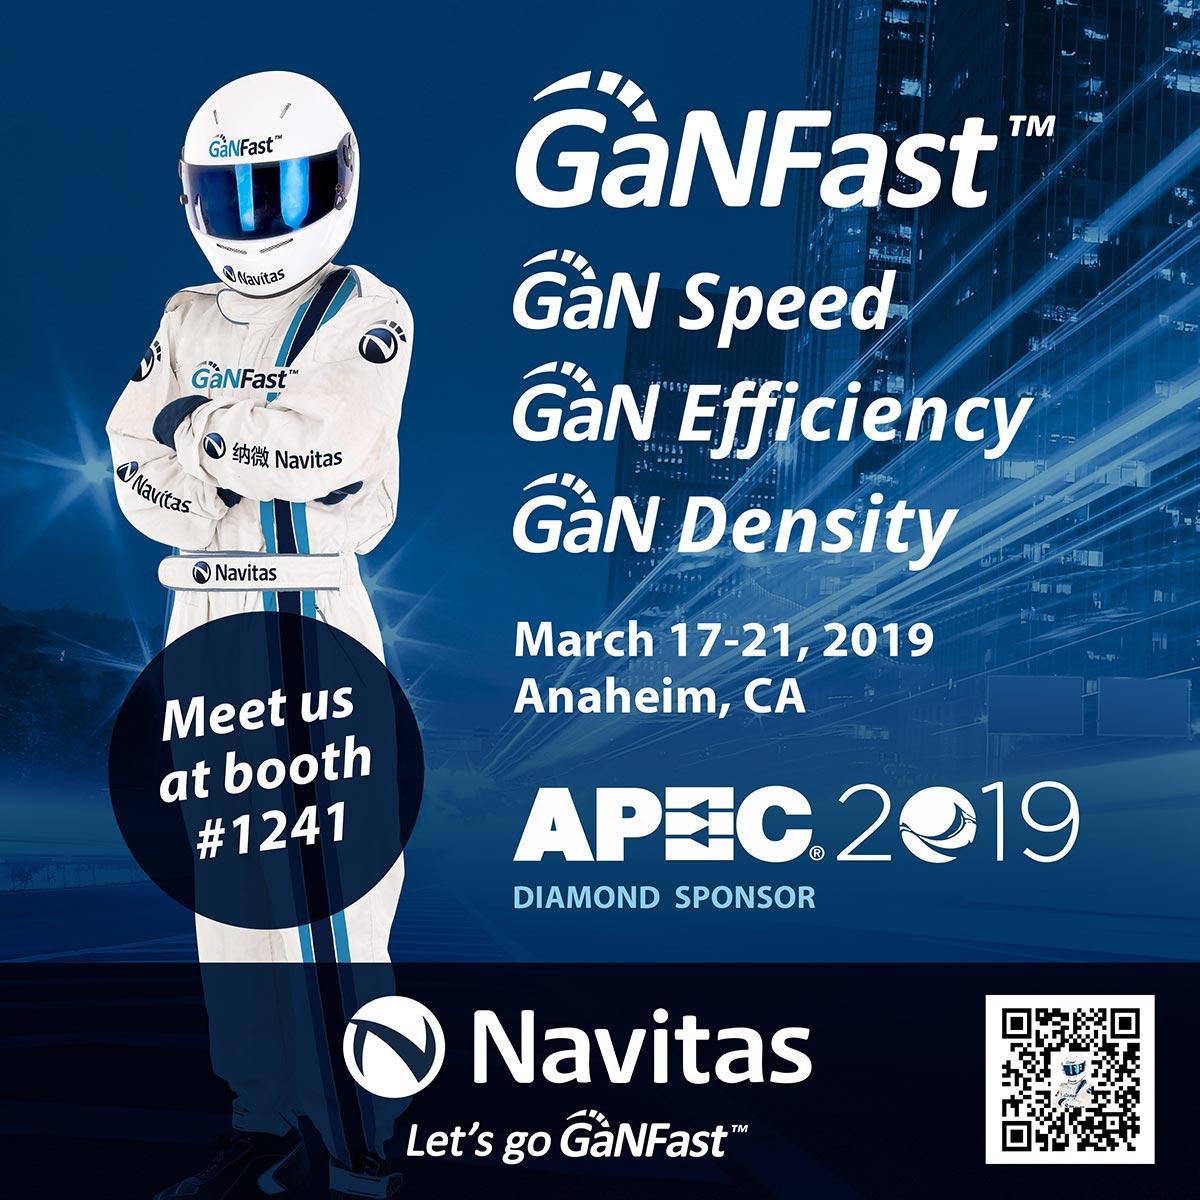 Navitas to Showcase GaNFast™ Charging Technology at APEC 2019